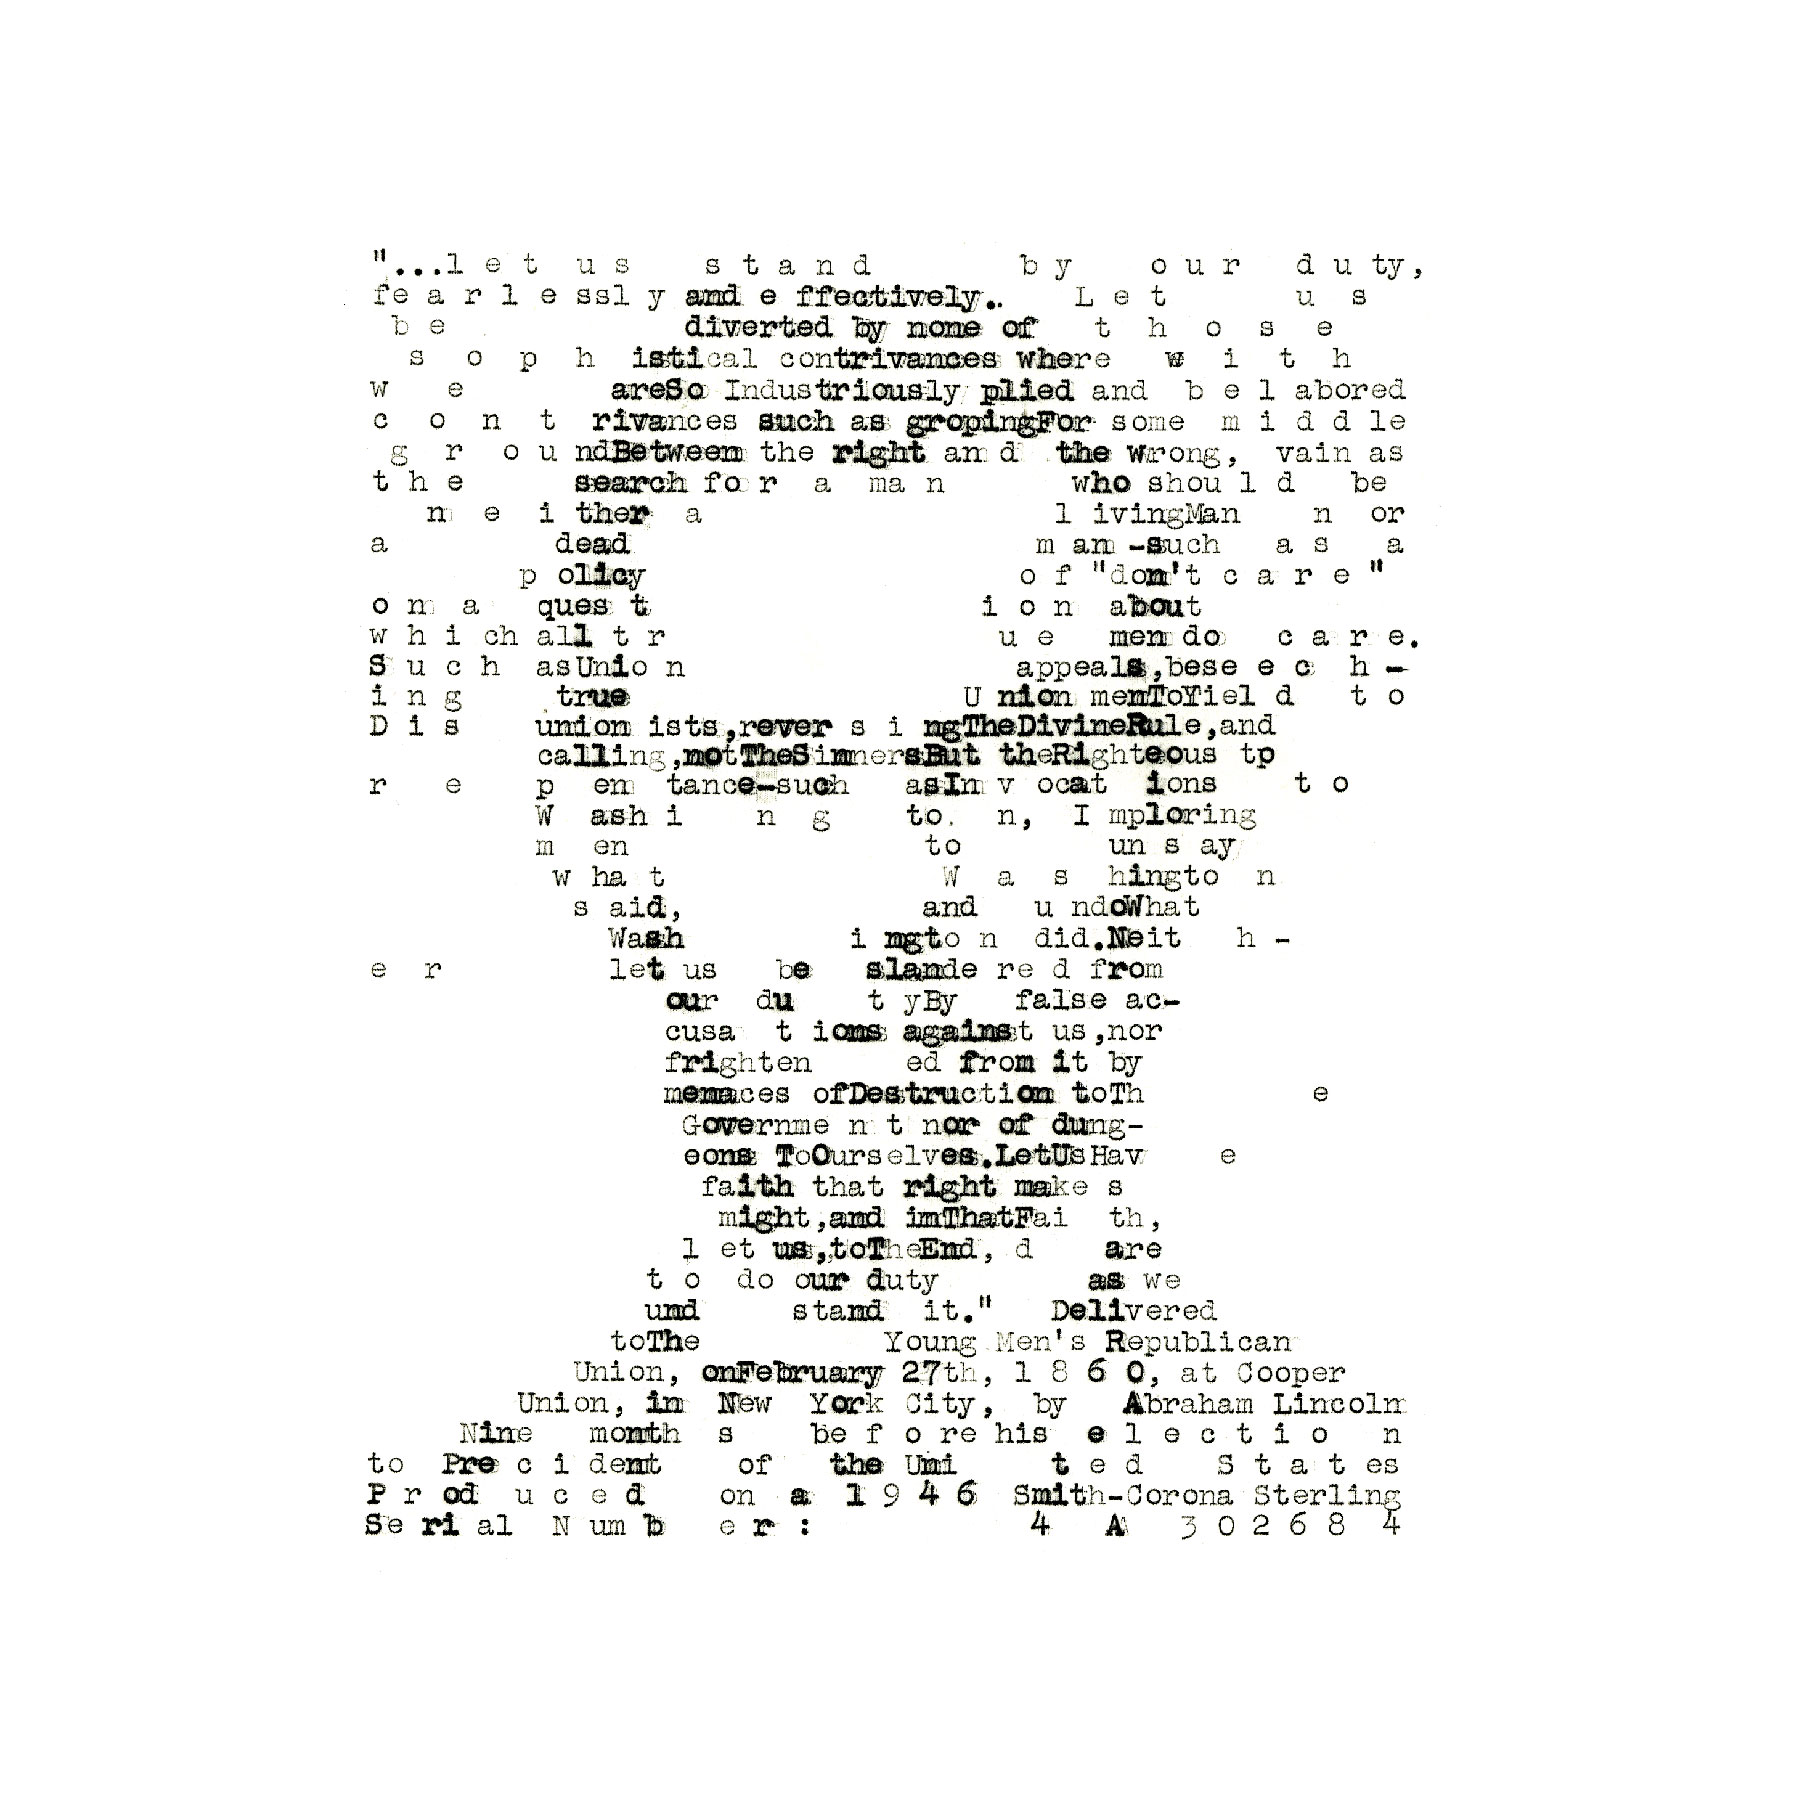 LincolnTyped.jpg